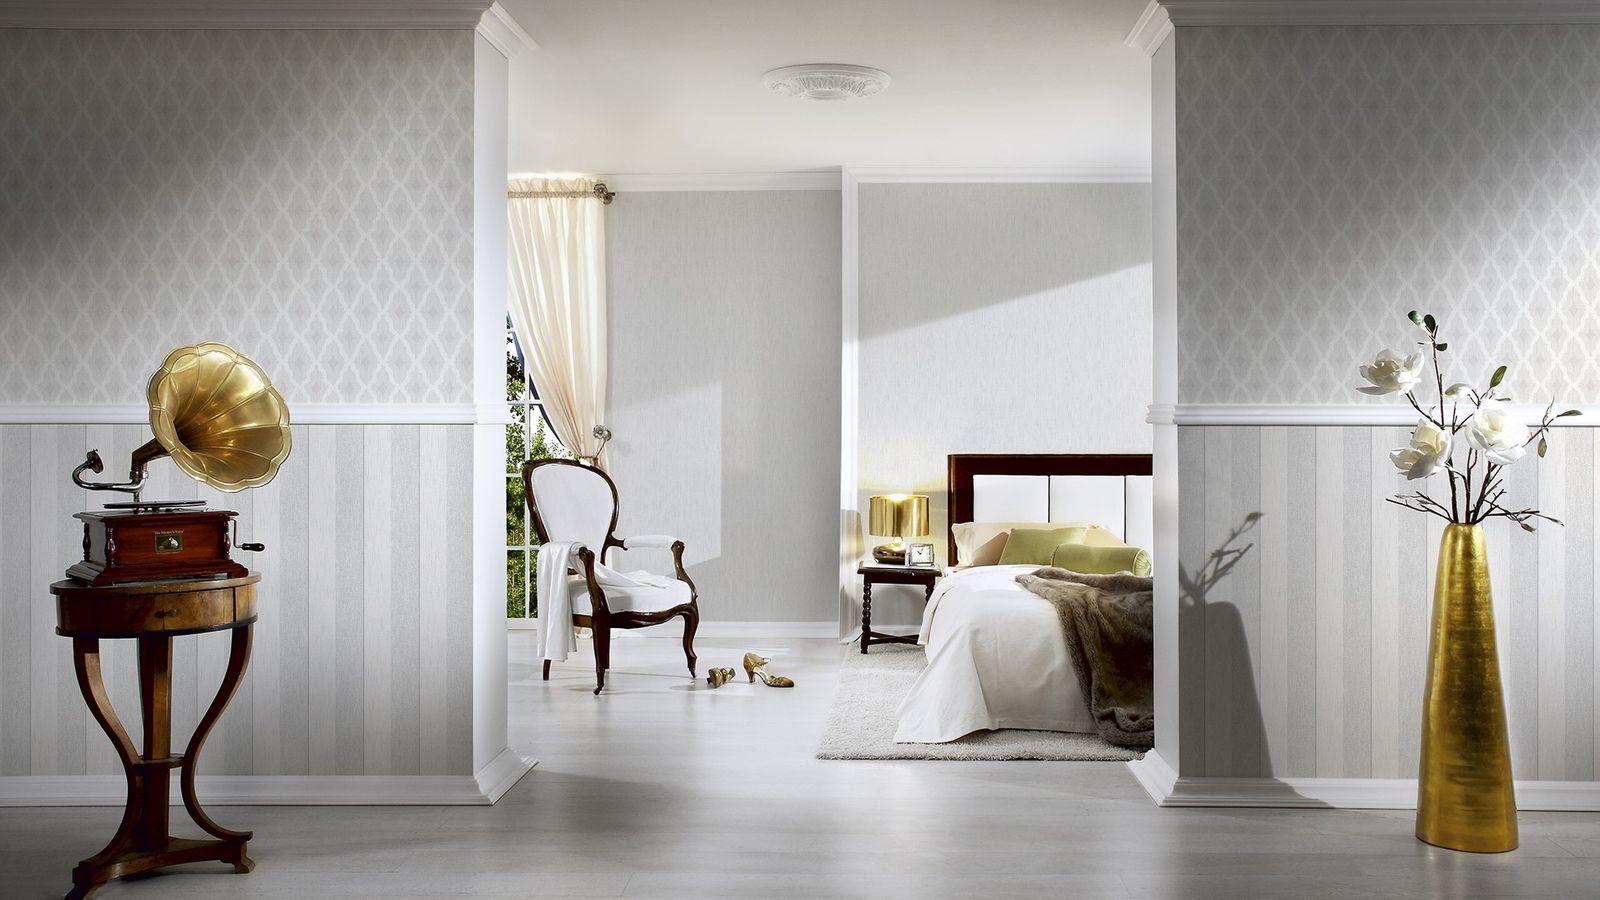 tapete vlies kariert wei grau tessuto 96197 1. Black Bedroom Furniture Sets. Home Design Ideas